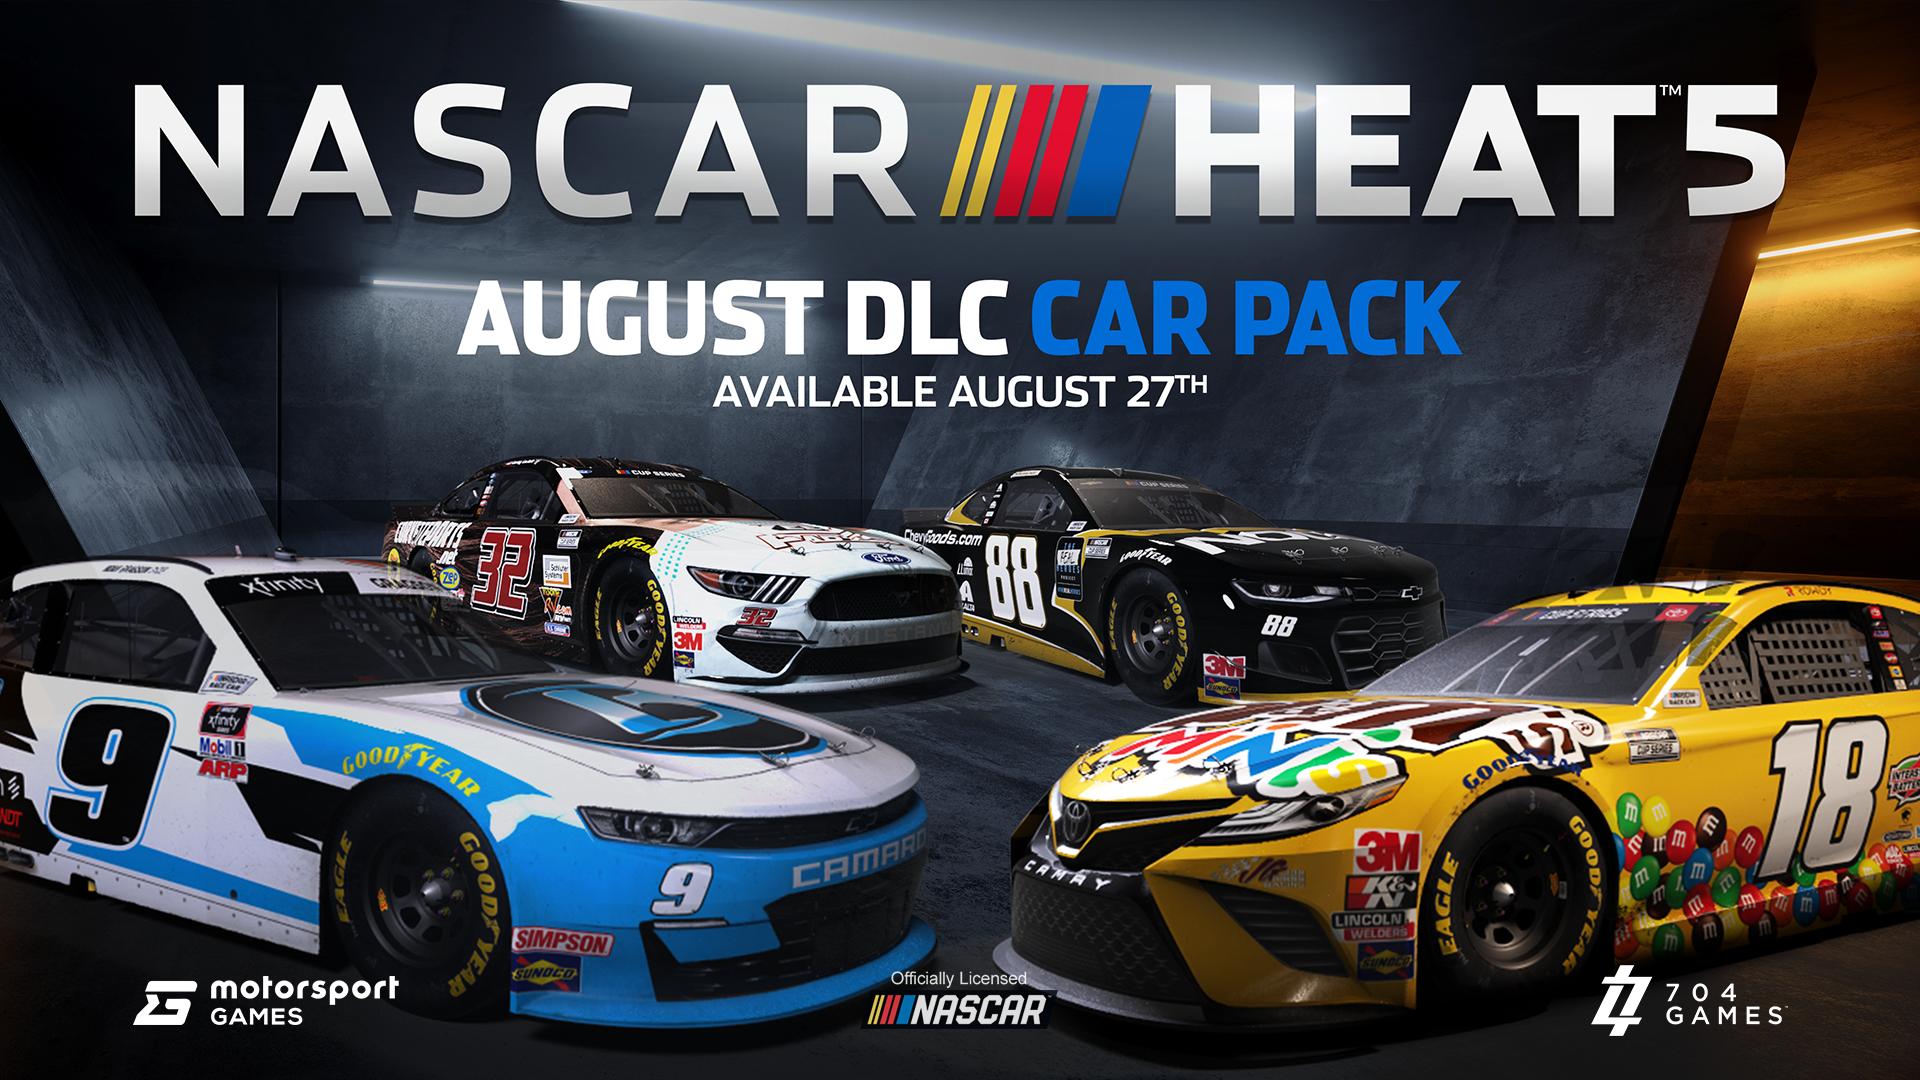 NASCAR Heat 5 August DLC